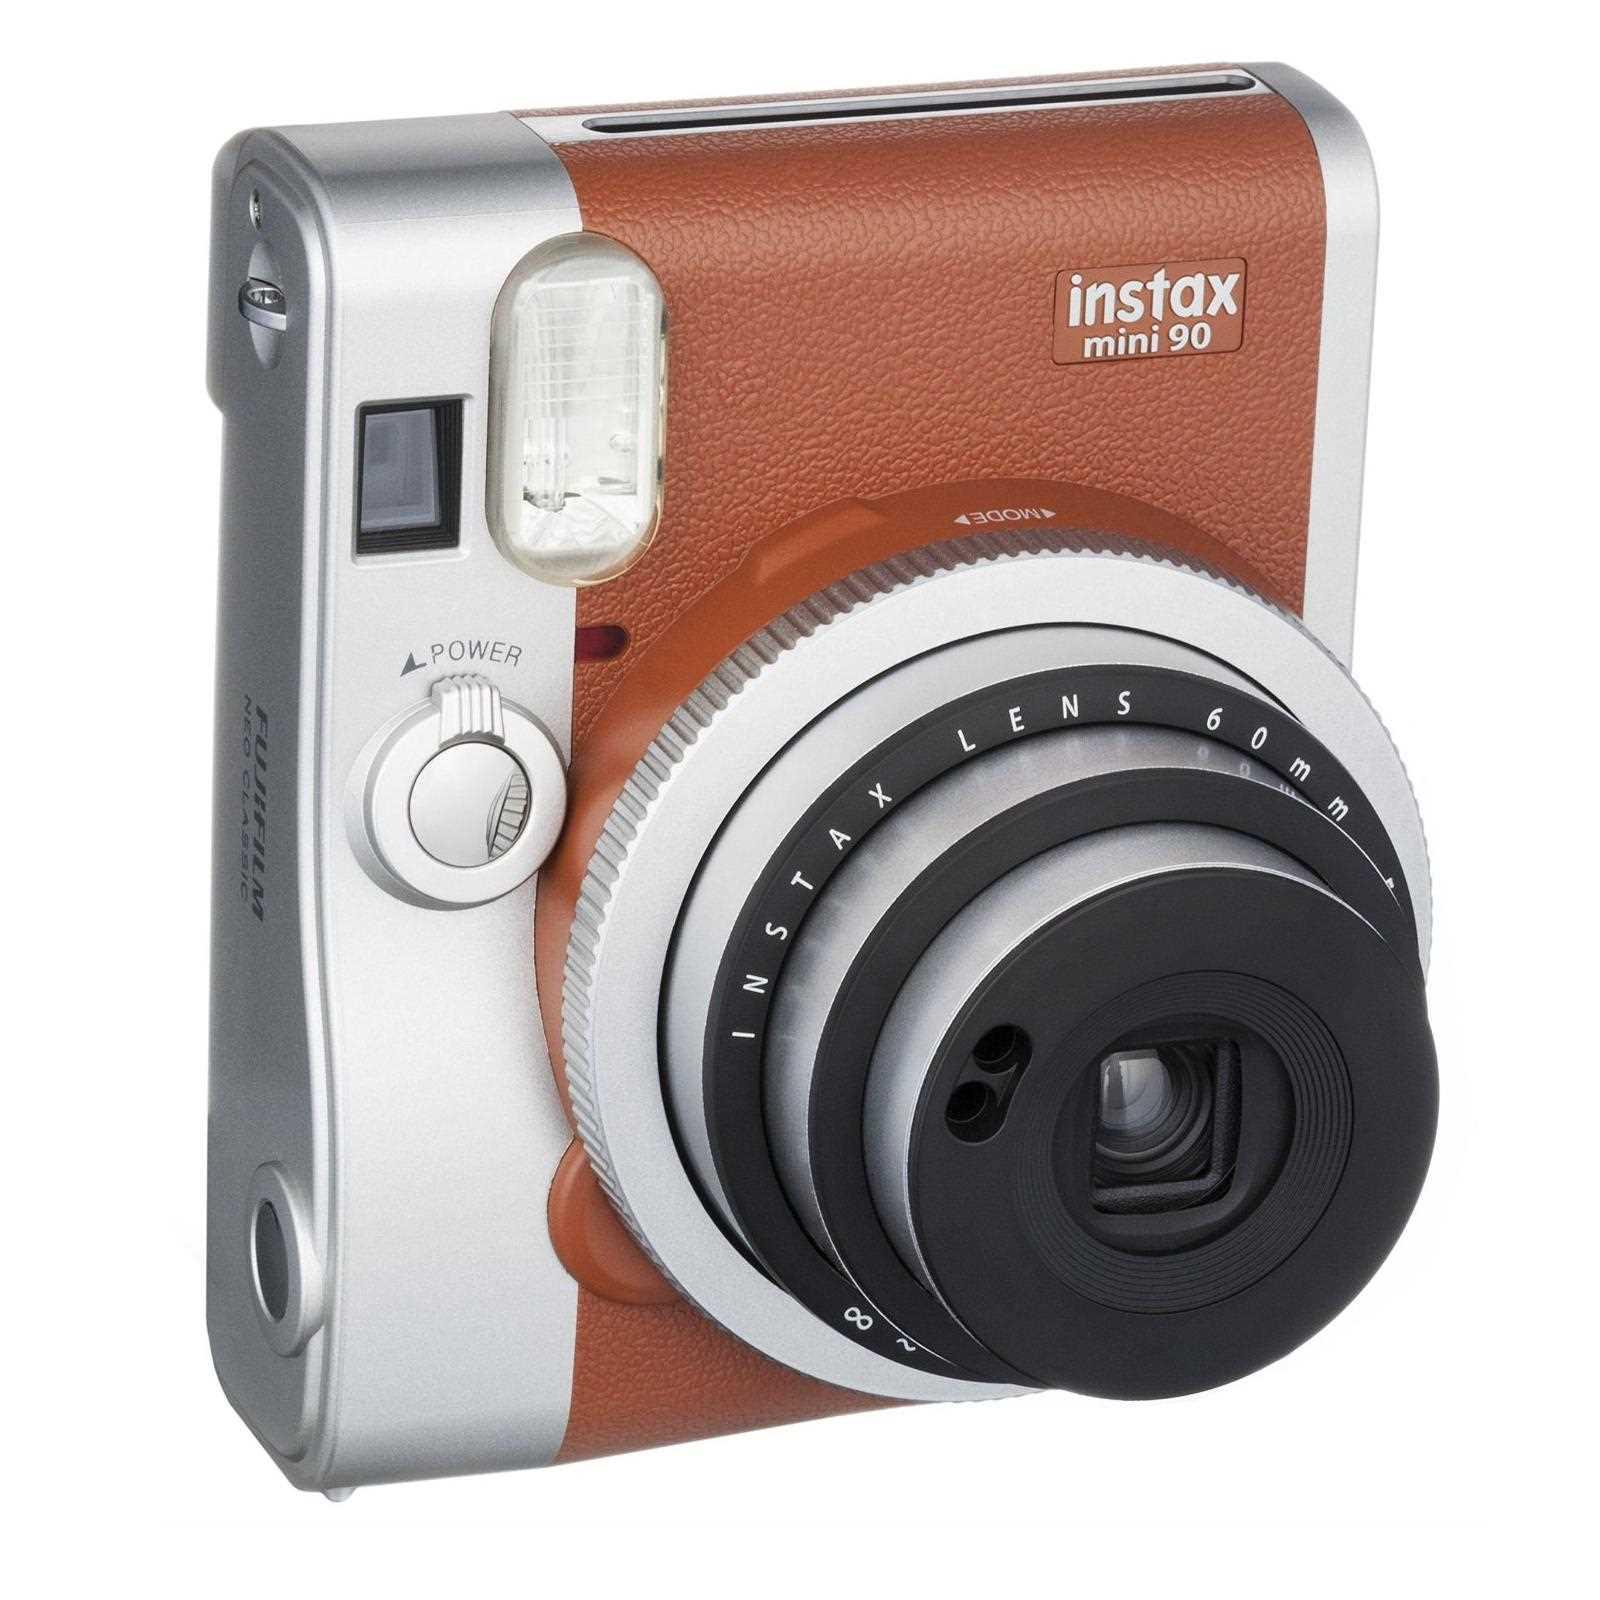 Camera Fujifilm Dslr Camera Price fujifilm camera price list in india 2017 lowest instax mini 90 instant camera